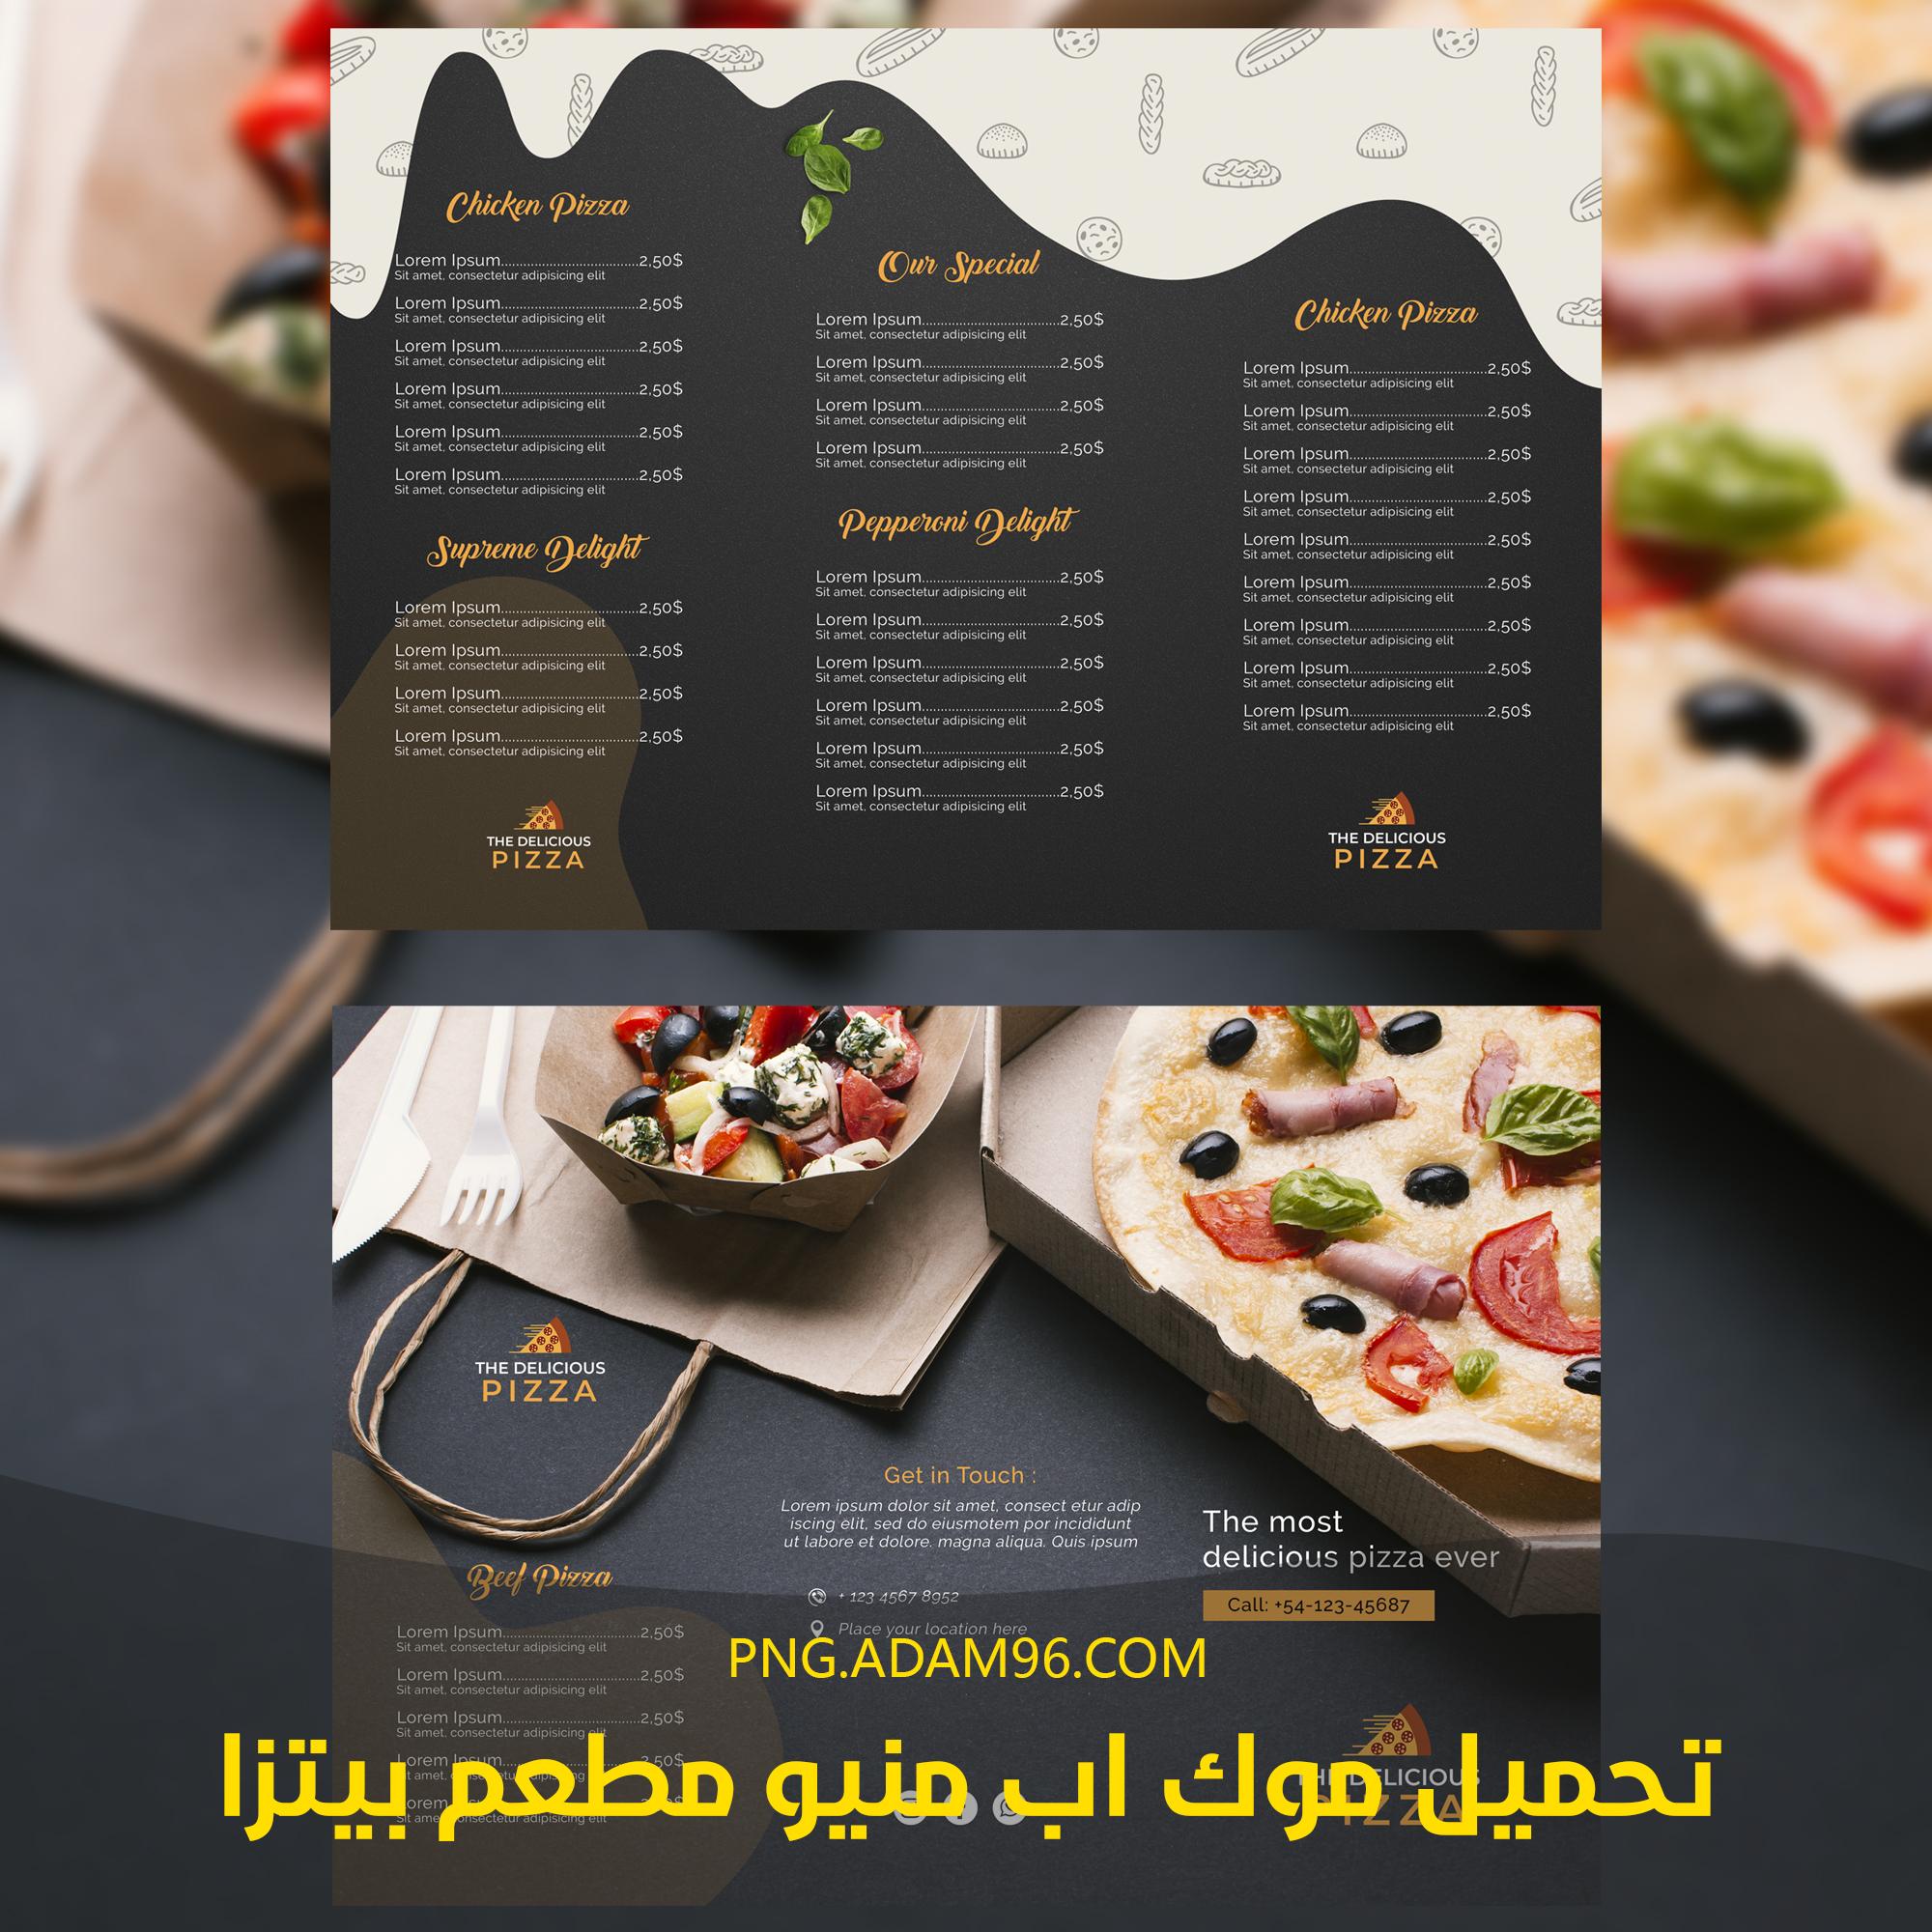 تحميل موك اب منيو مطعم بيتزا عالي الجودة بصيغة Psd Restaurant Menu تحميل صور Png